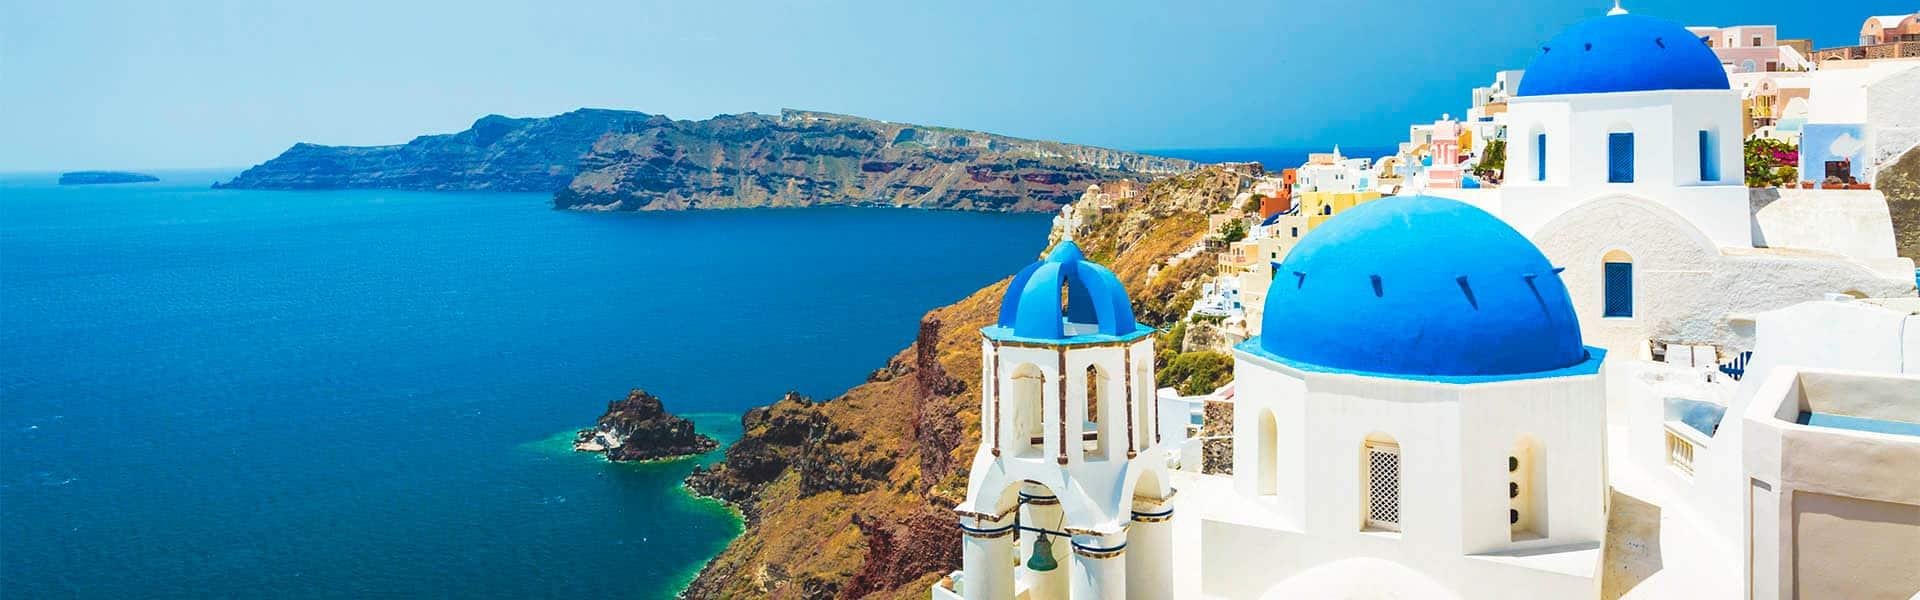 Greek Isles: Santorini, Mykonos & Rhodes